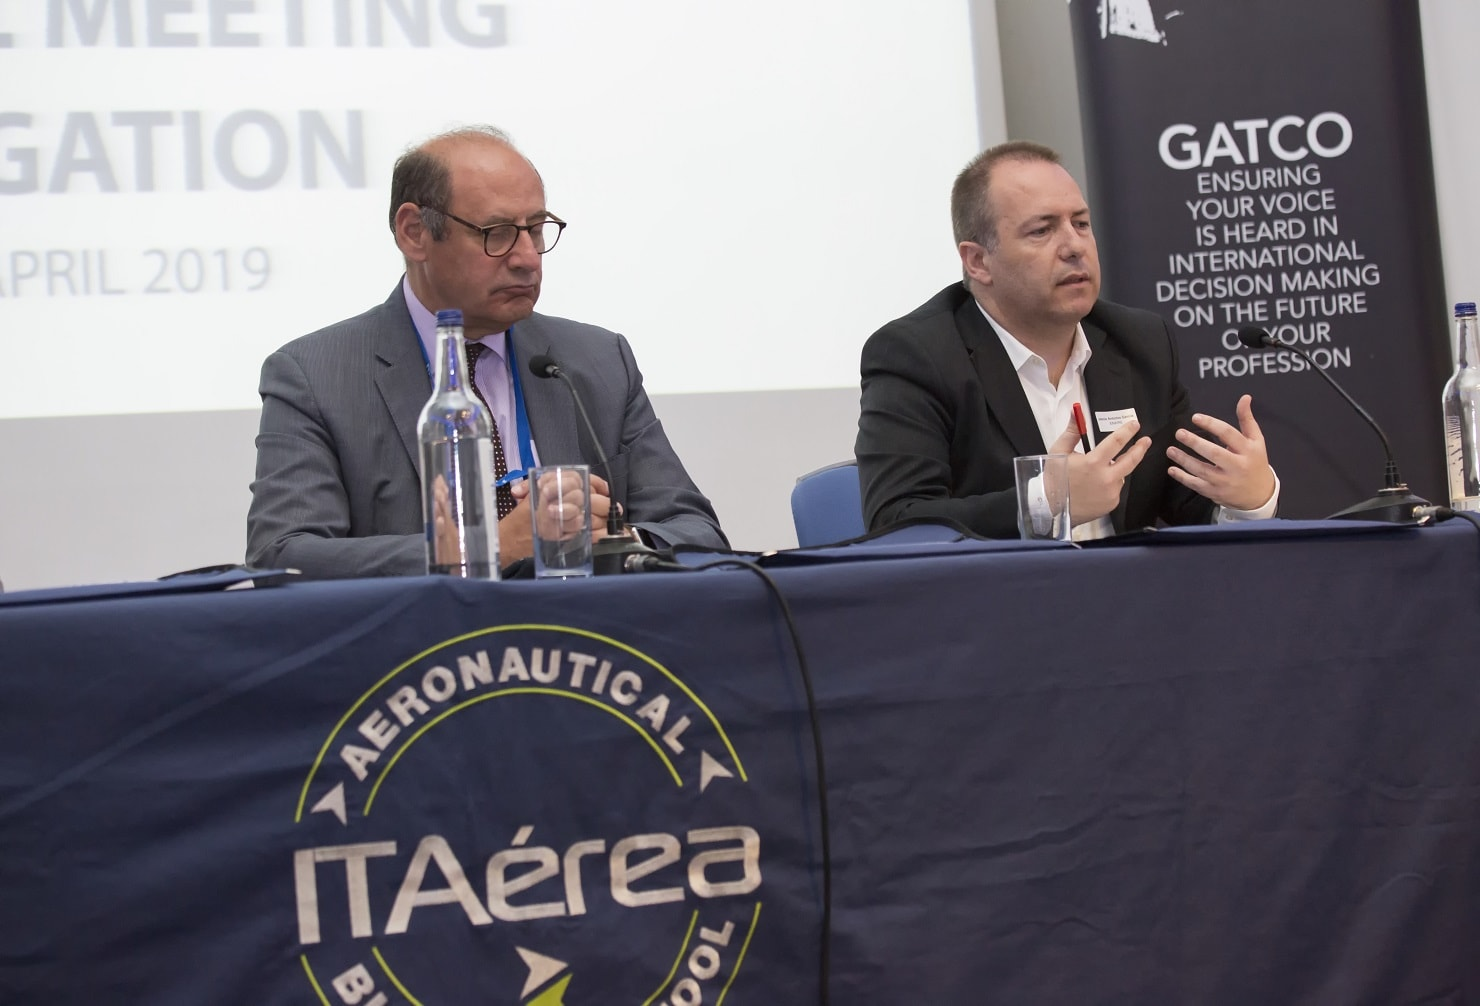 11 min - III Sector Meeting: Air Navigation